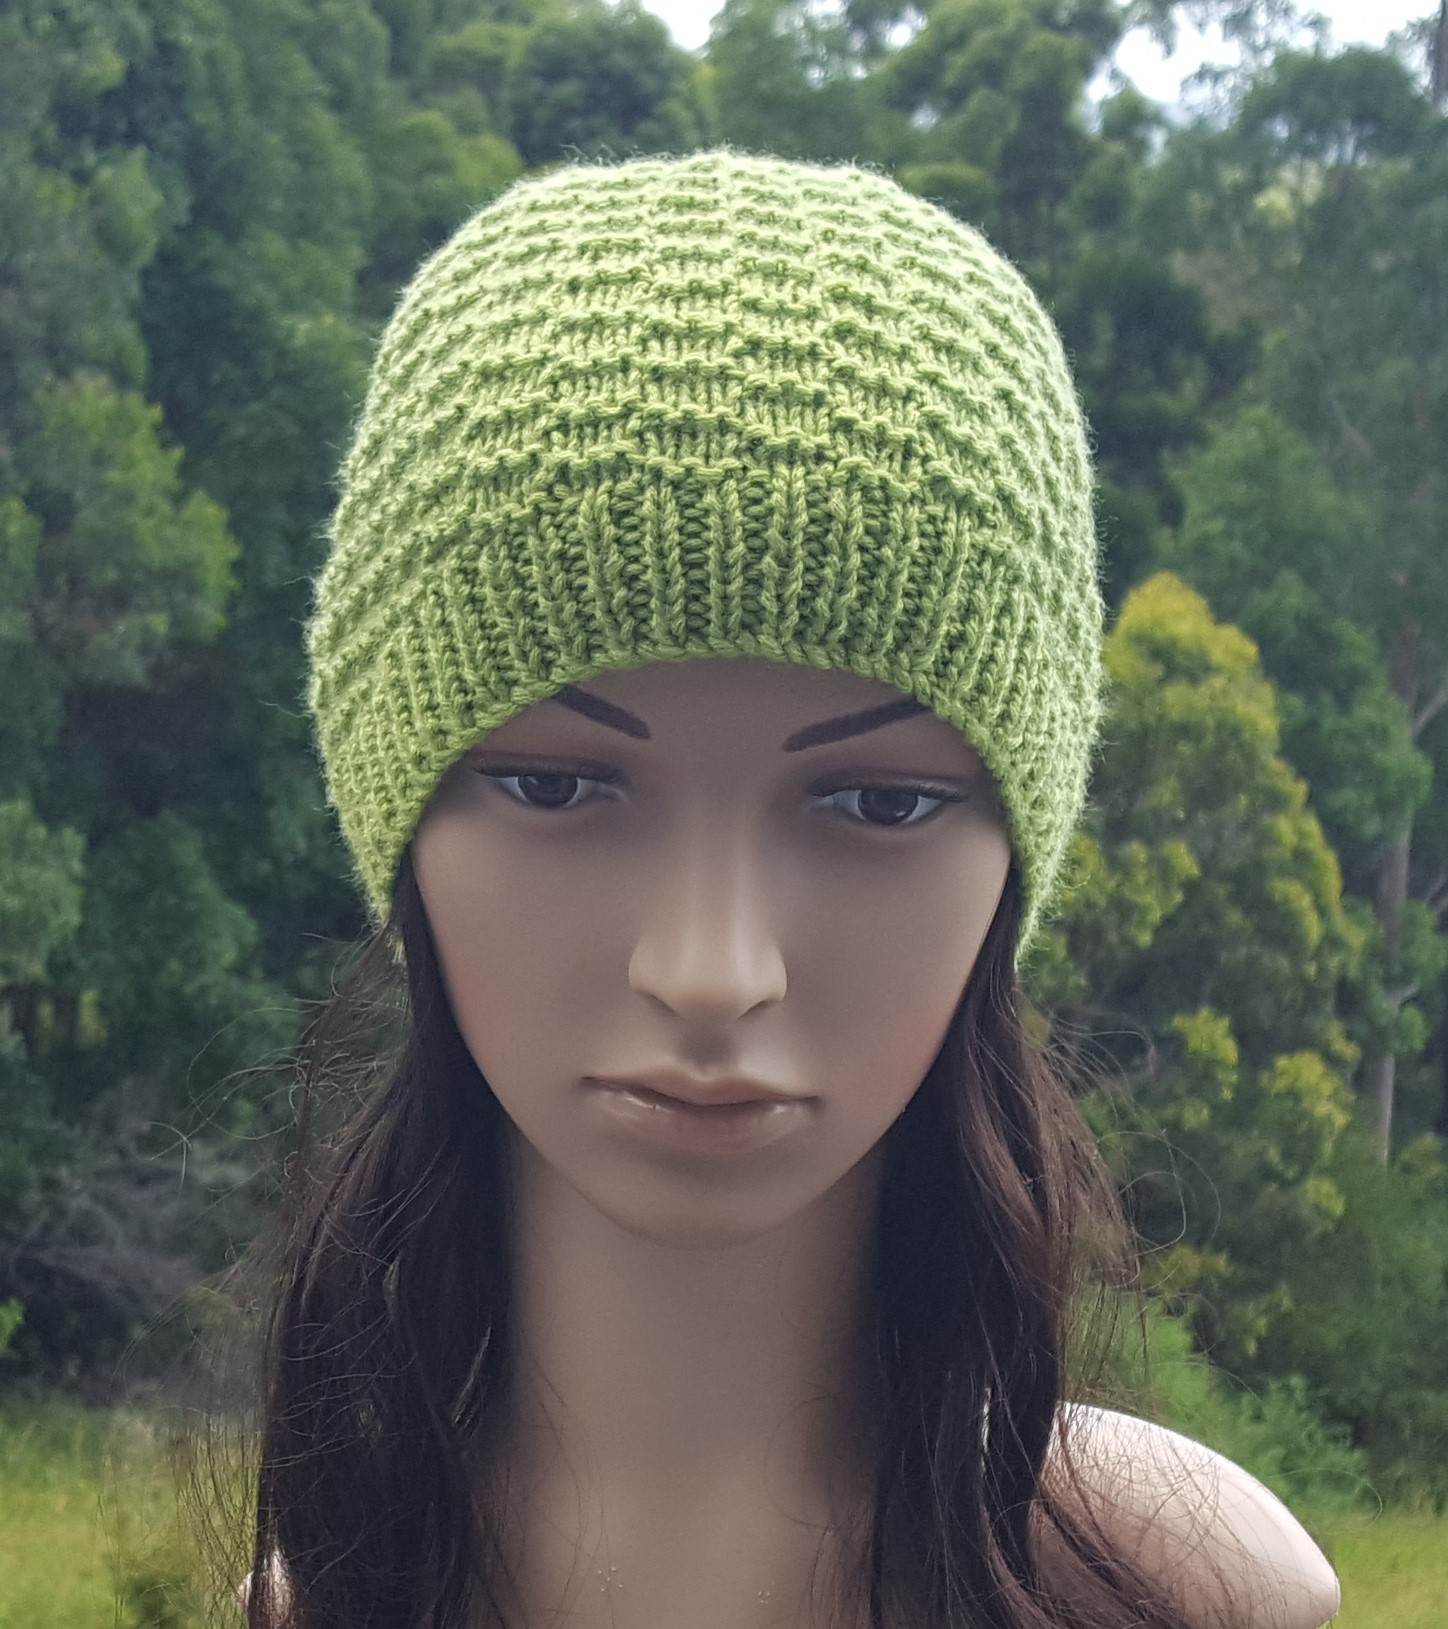 Knitting Patterns Online - Knitting Patterns for Beanies ...